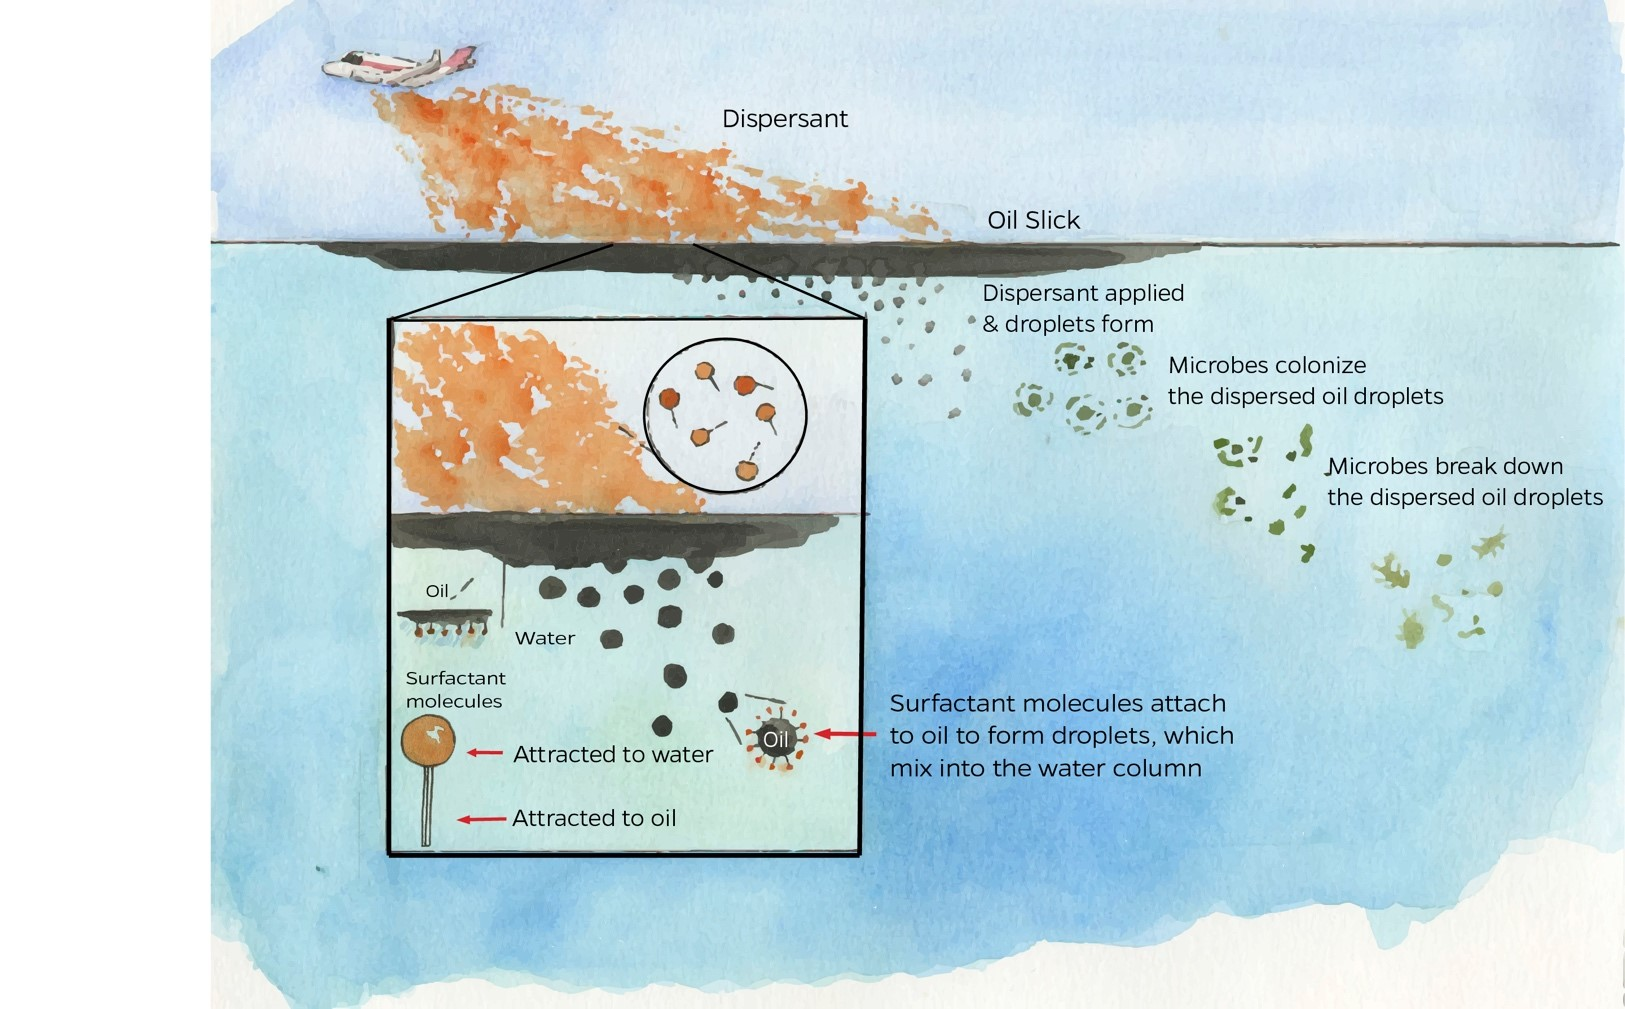 Updated dispersants graphic